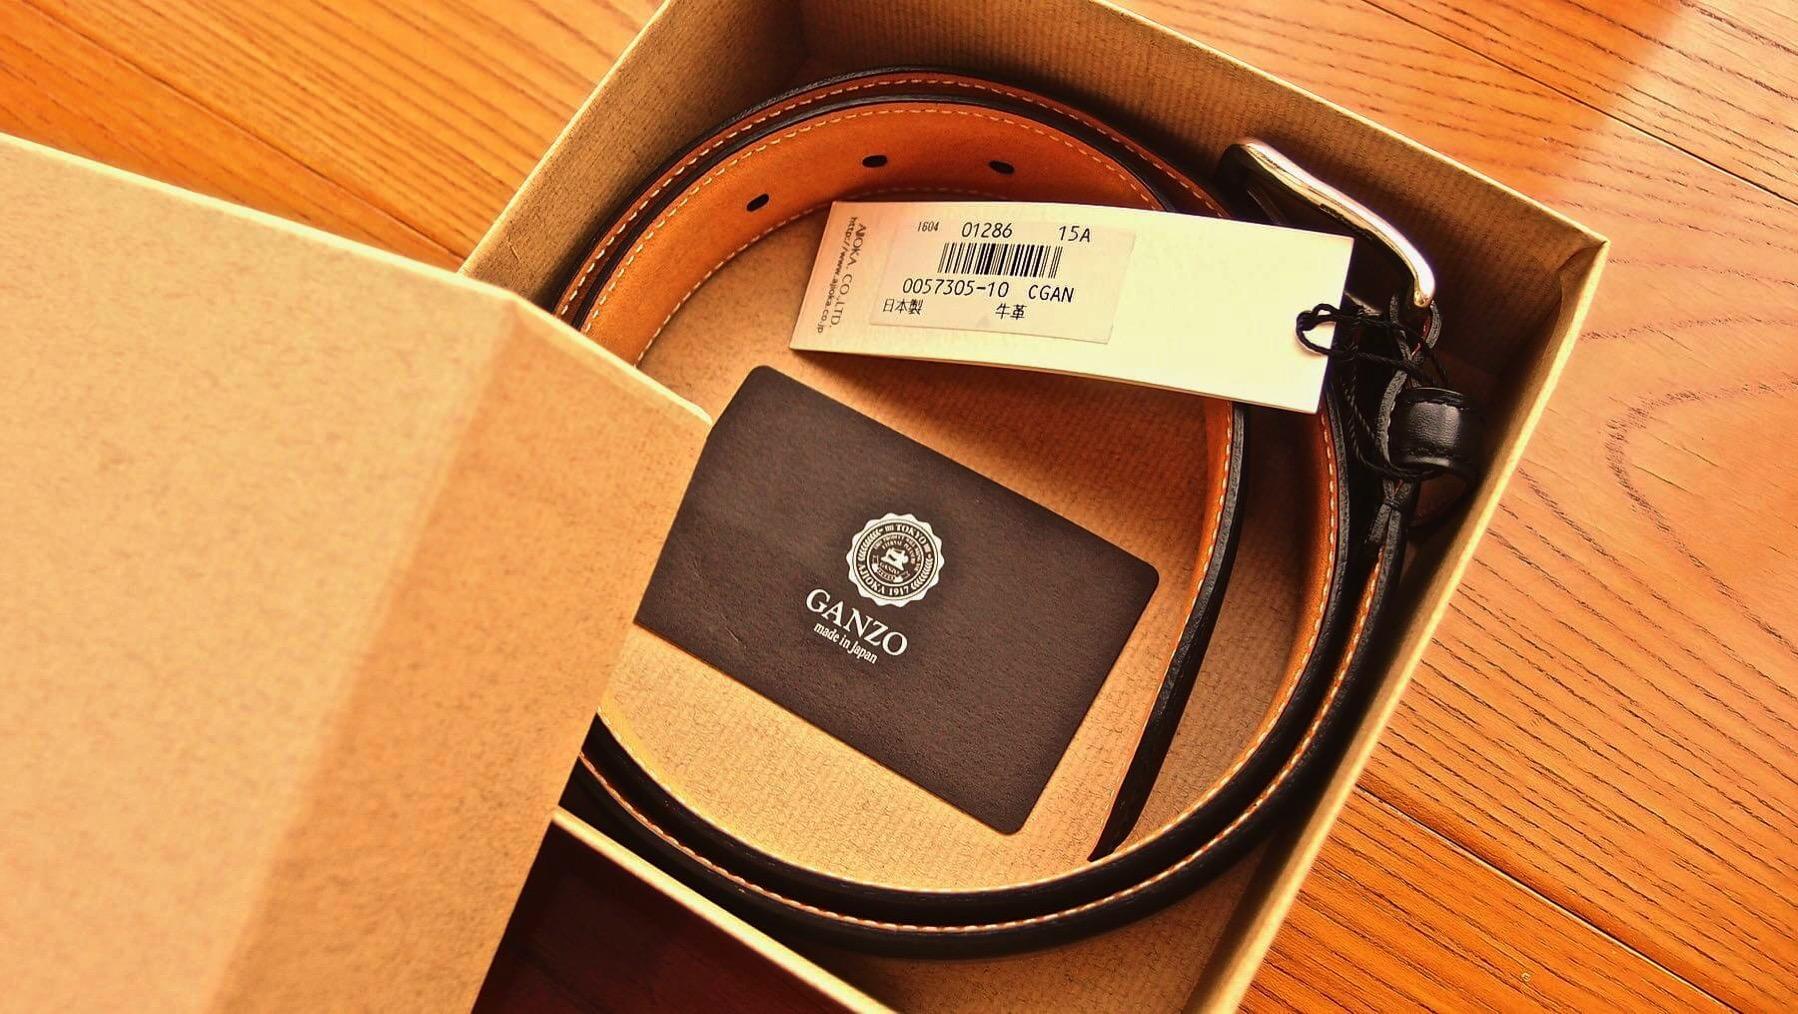 14 Ganzo leather belt BRIDLE BOX Opened